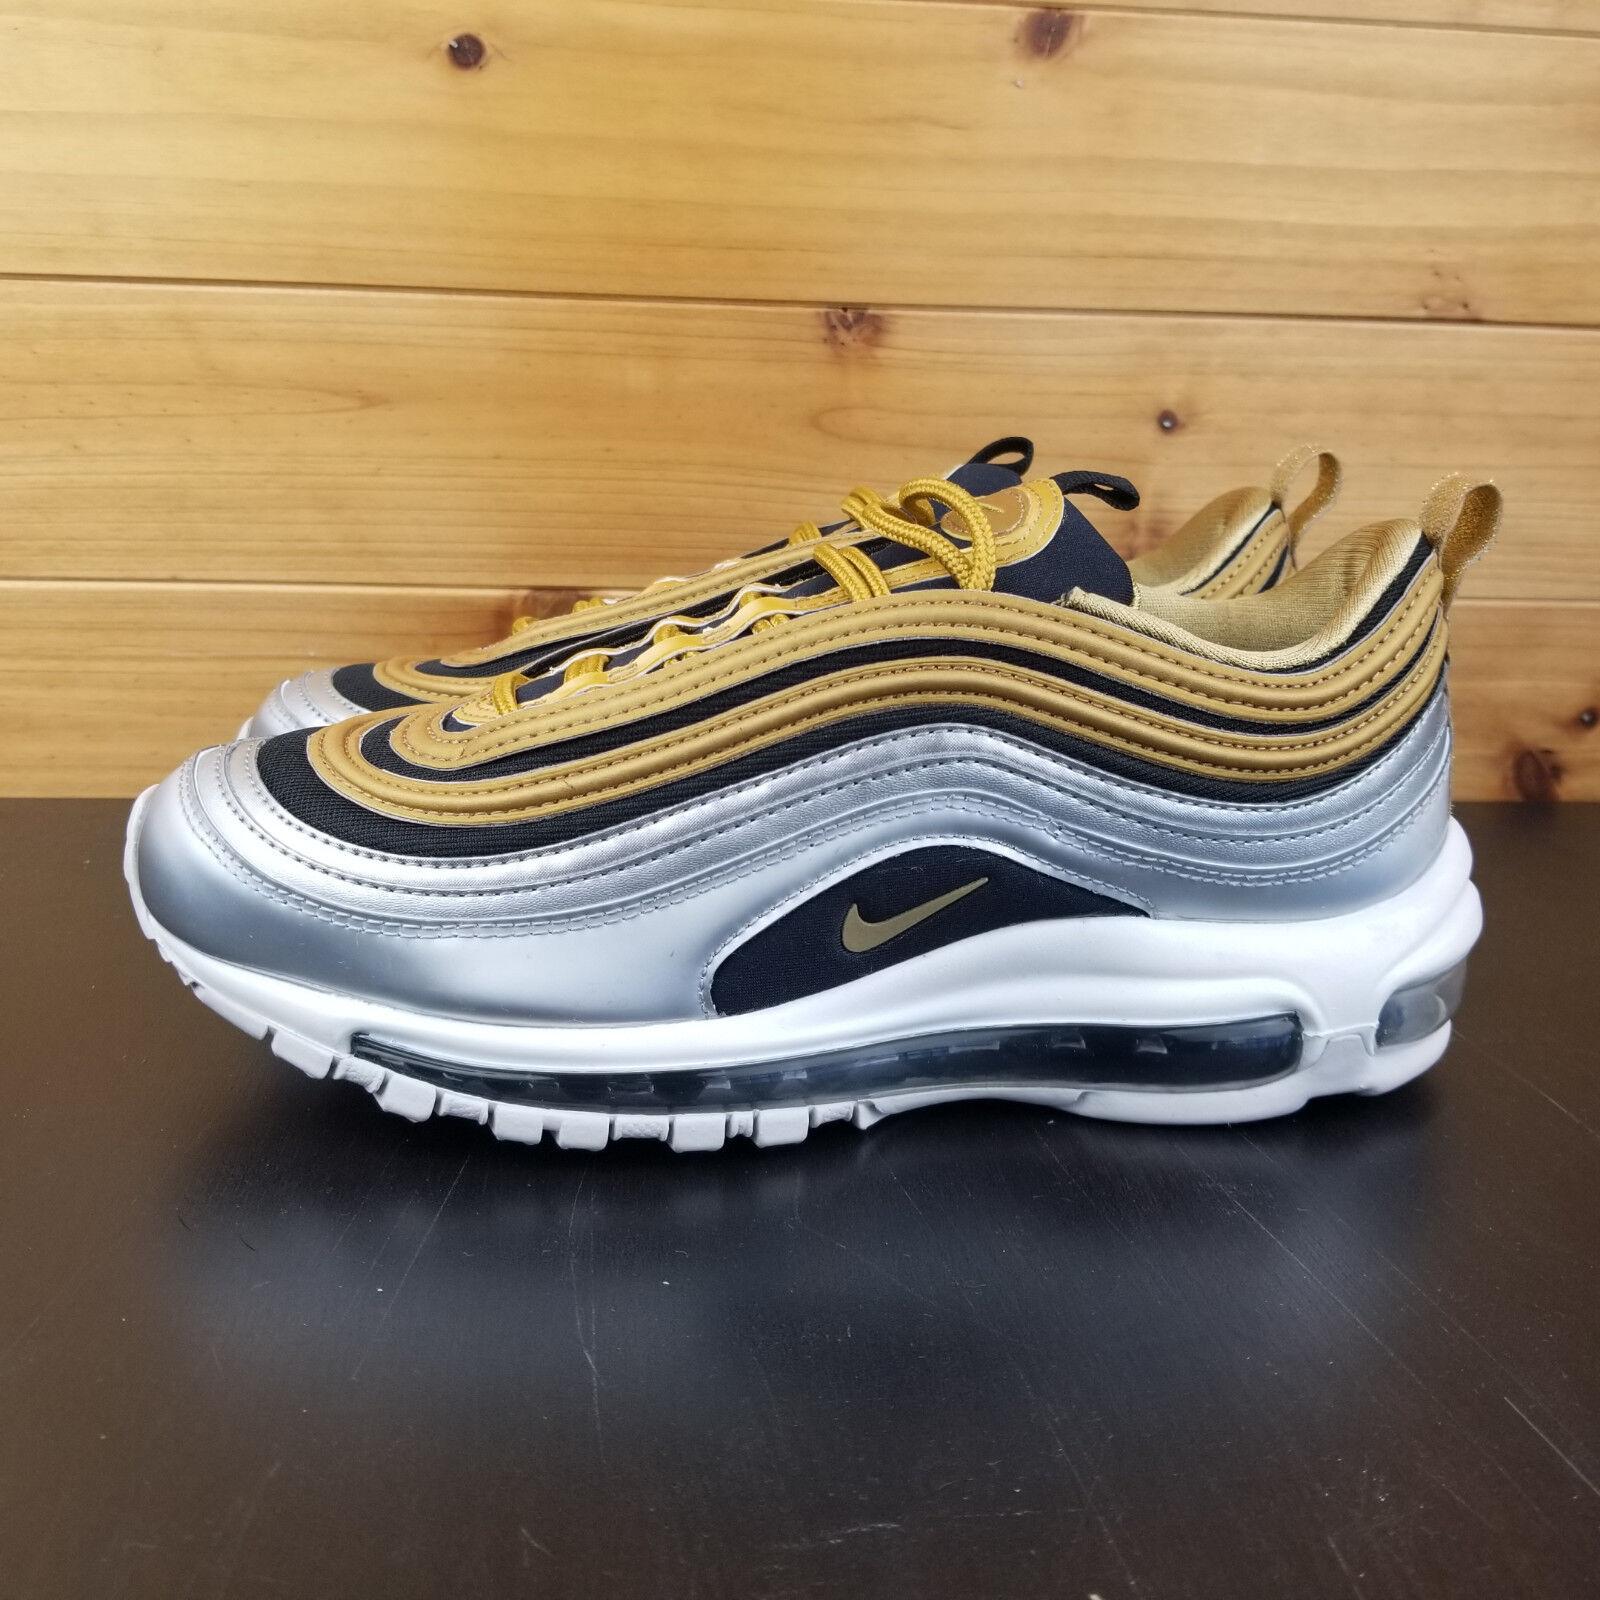 Nike Air MAx 97 SE gold Metallic Silver Women's shoes Sz 8.5 AQ4137 700